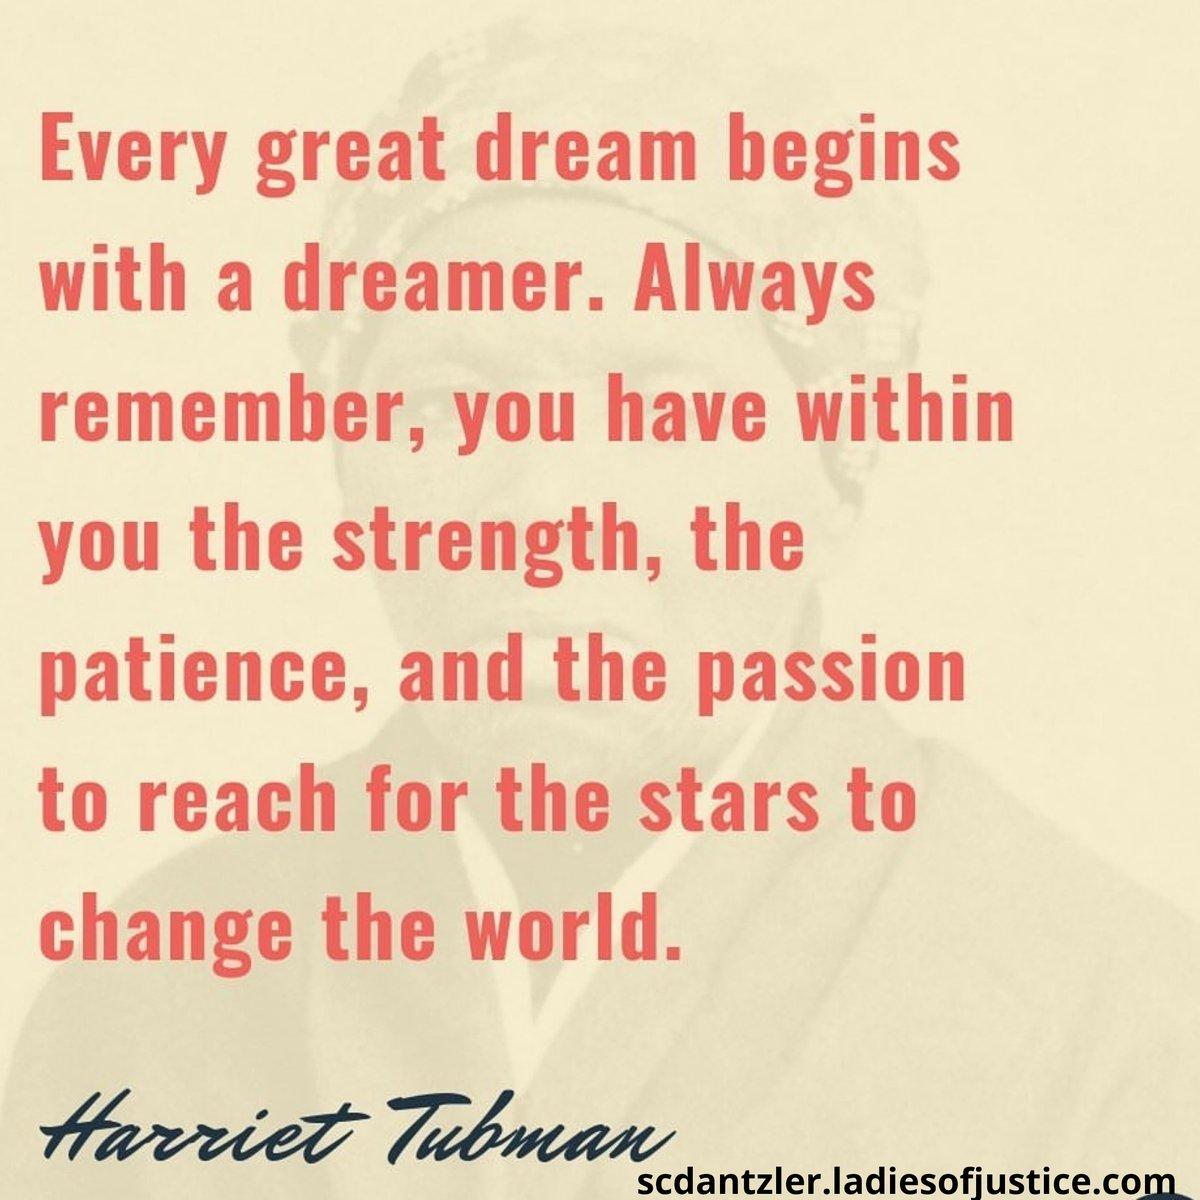 #winnersneverquit #success #entrepreneur #yourpath #dreambig #reachforthestars #ChangeTheWorldpic.twitter.com/W1ZWhCL9br